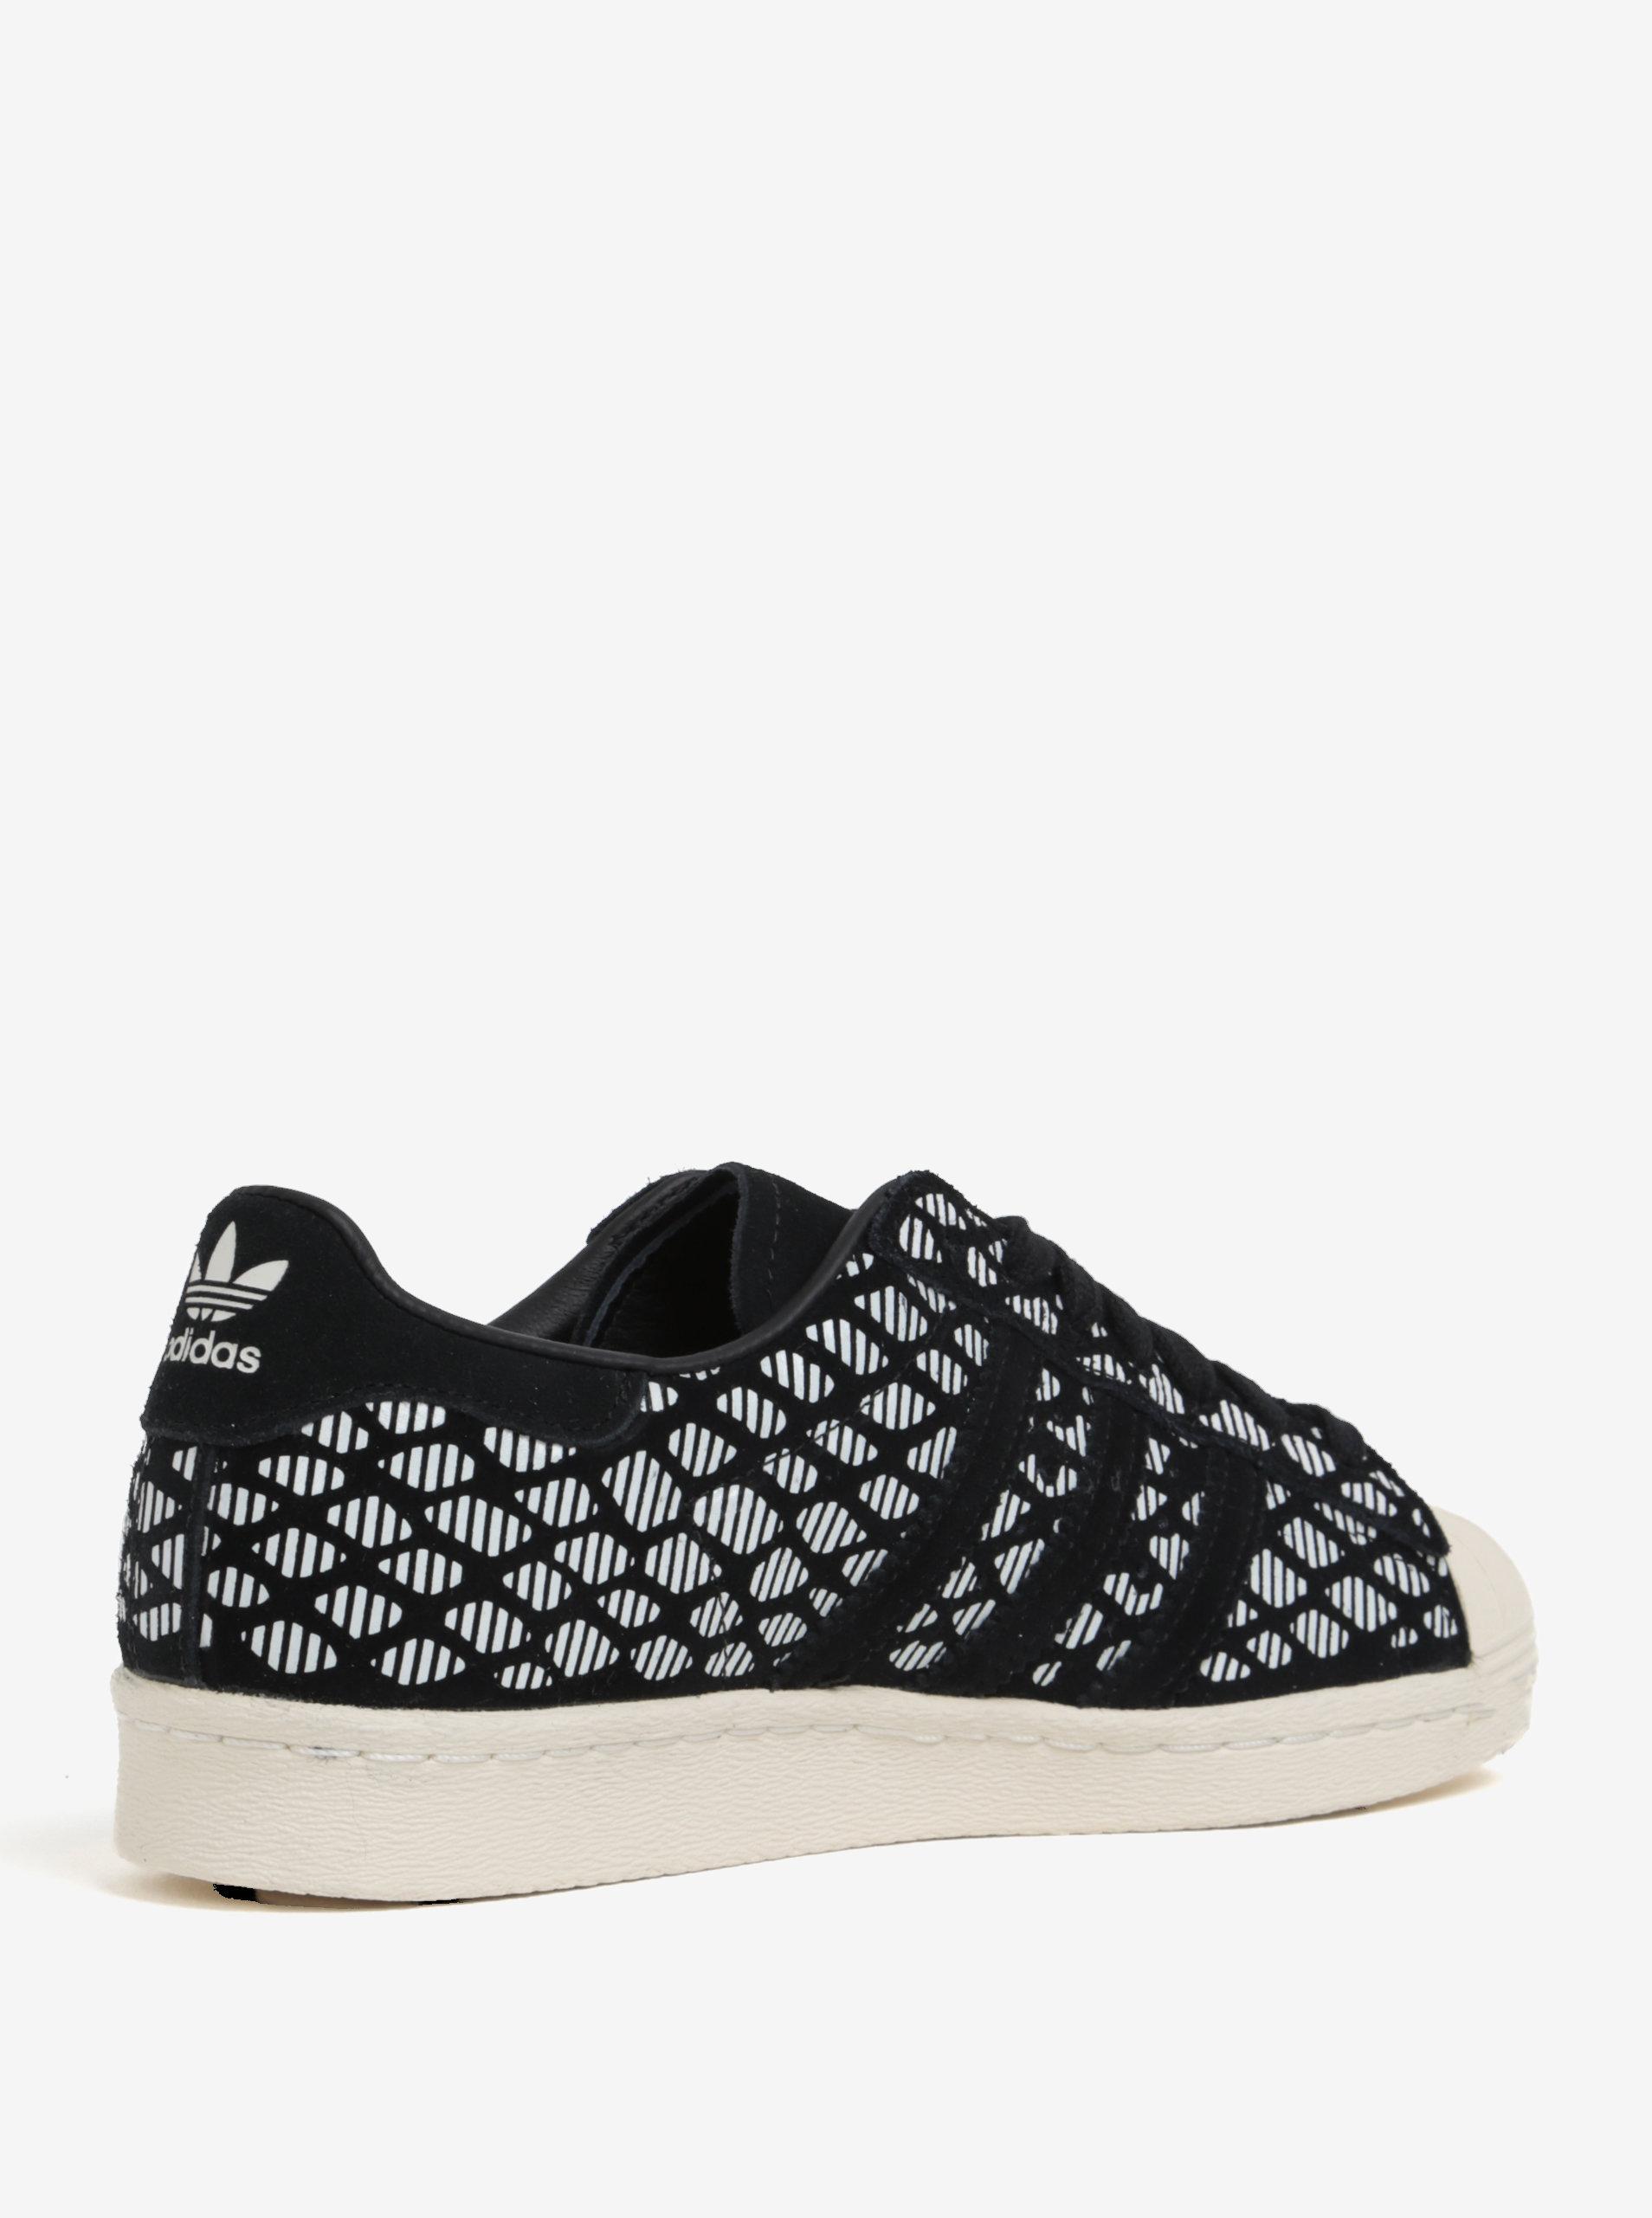 595f994f948e Bielo-čierne dámske semišové tenisky adidas Originals Superstar ...